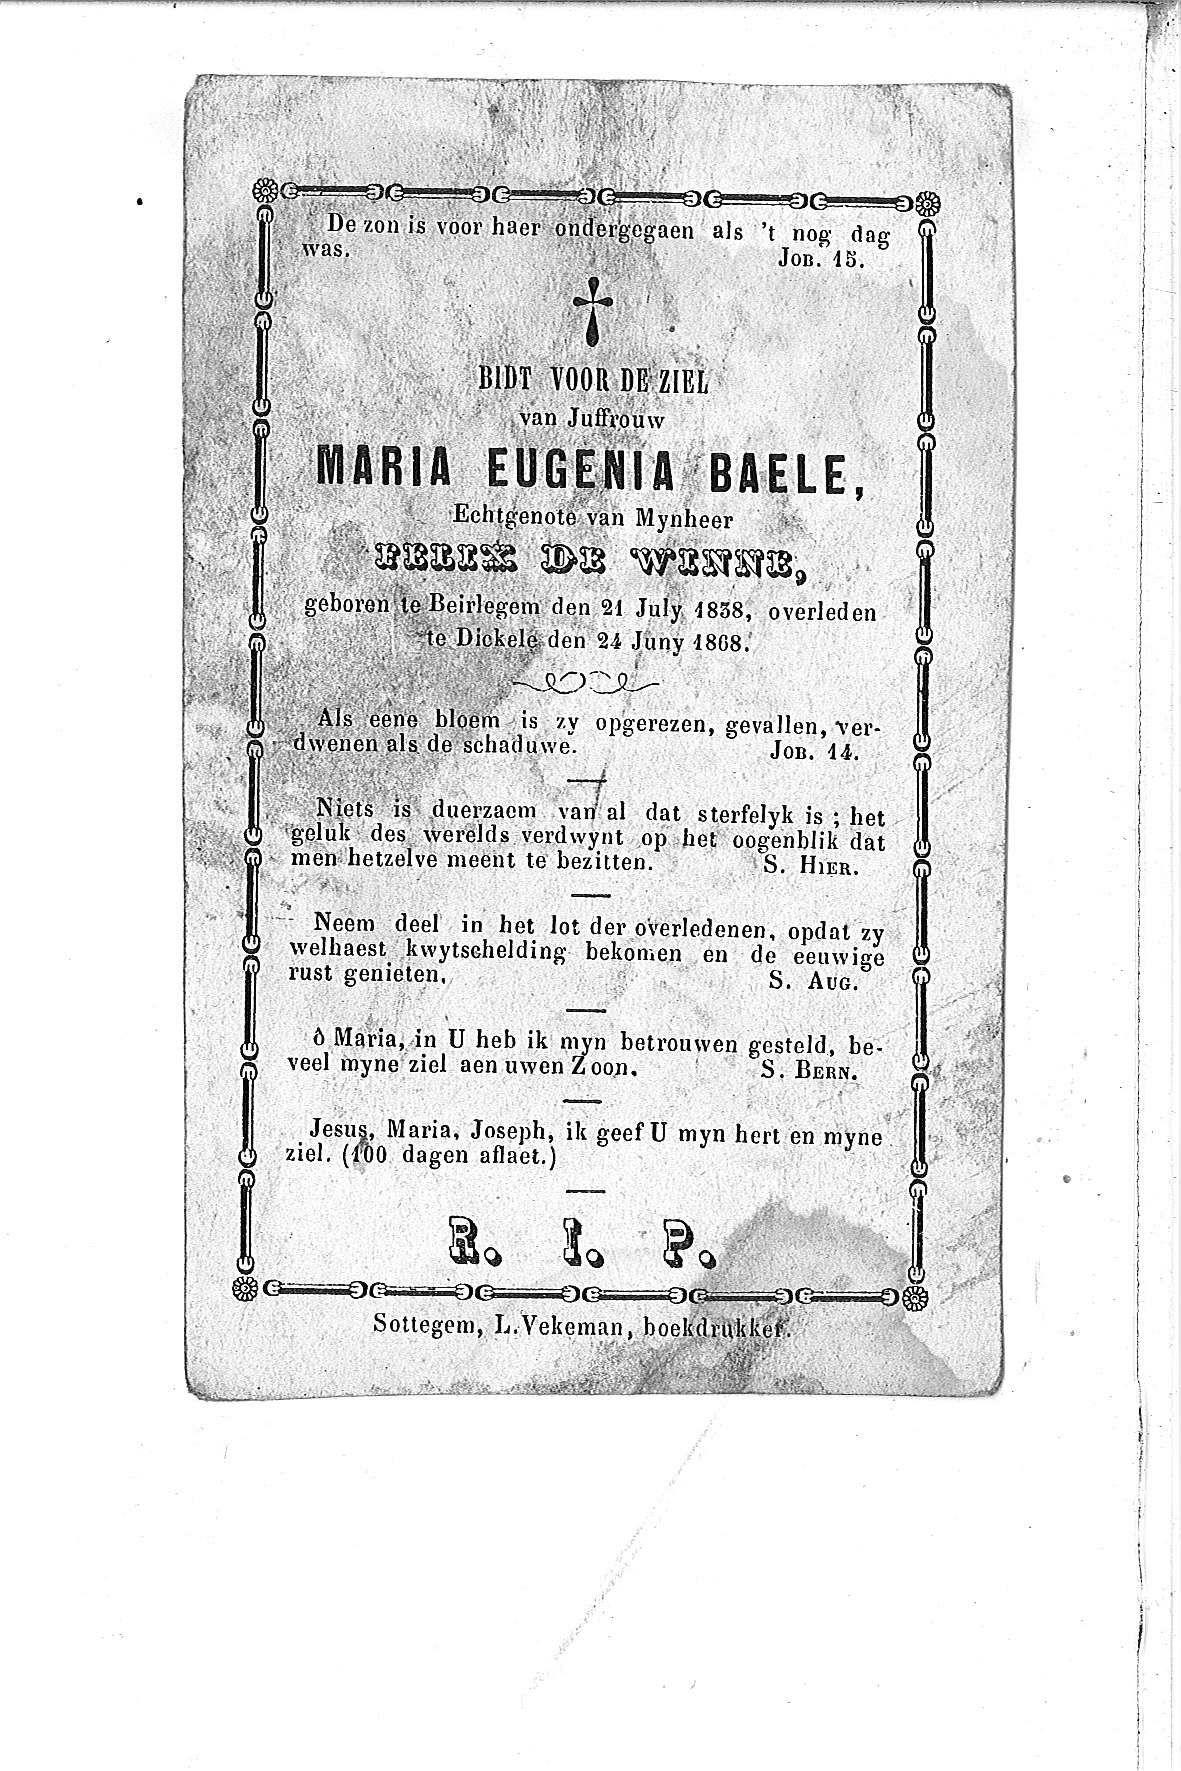 Maria-Eugenia(1868)20100928134653_00016.jpg